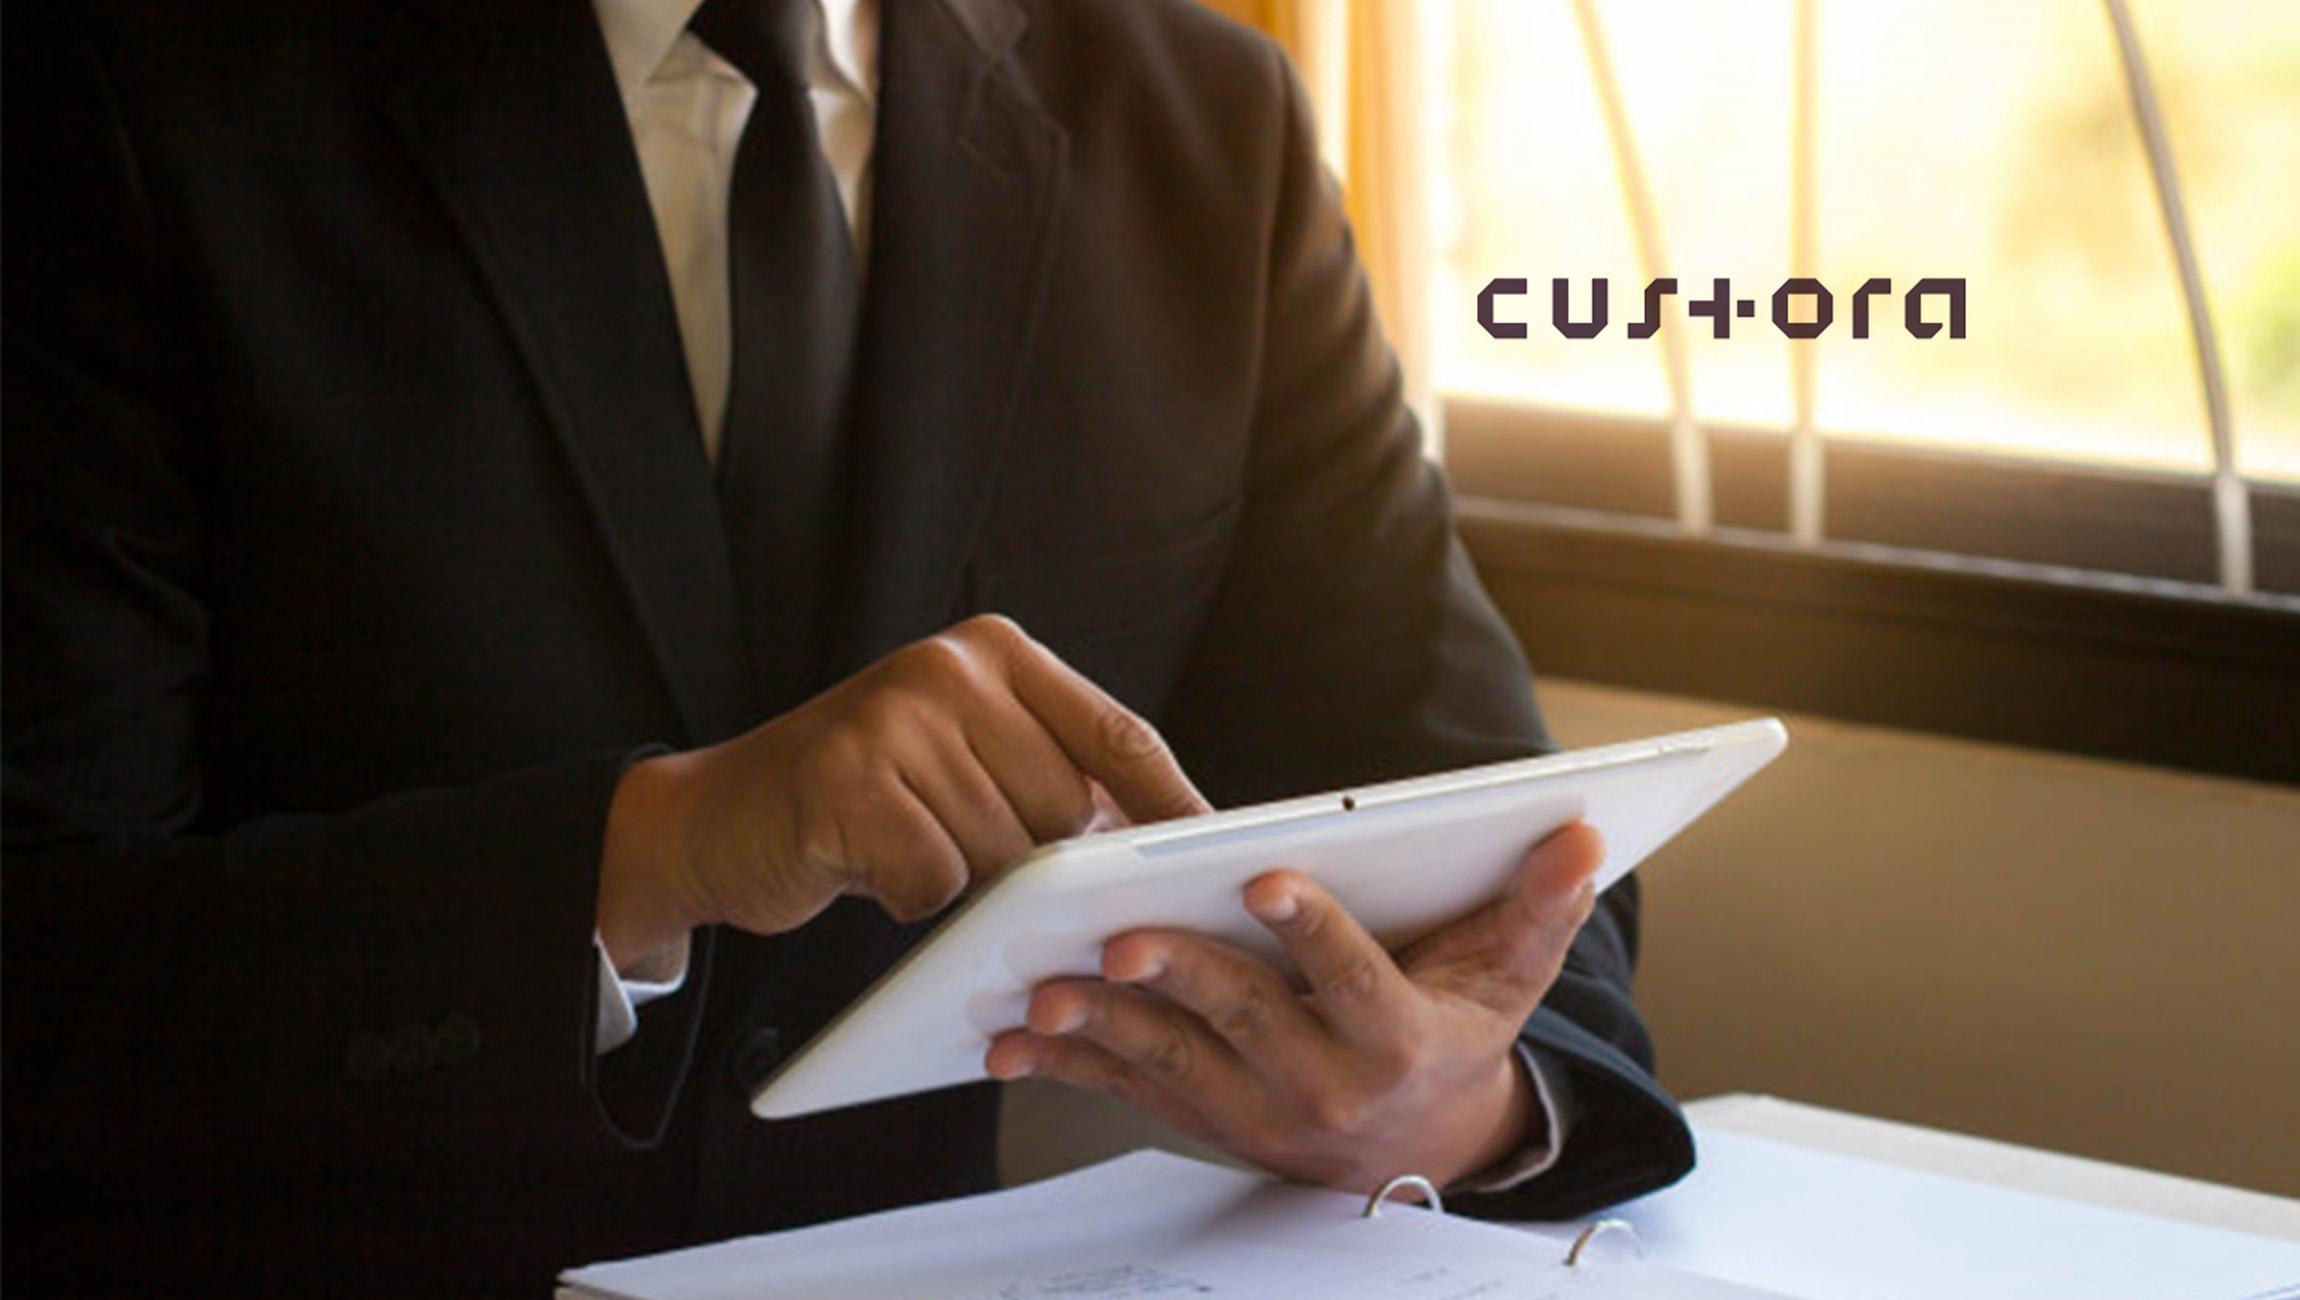 Custora Releases New Customer Intelligence Platform to Drive Consumer Loyalty